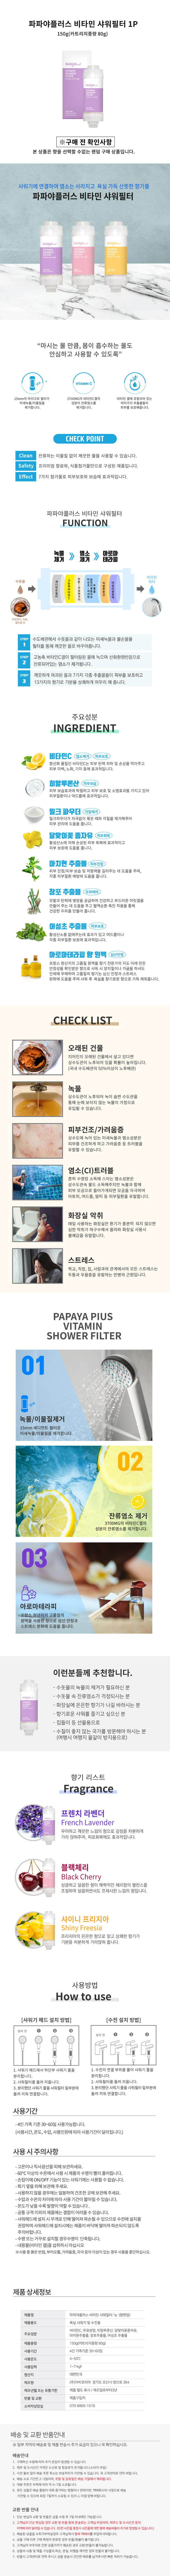 papaya_showerfilter_1P_detail.jpg